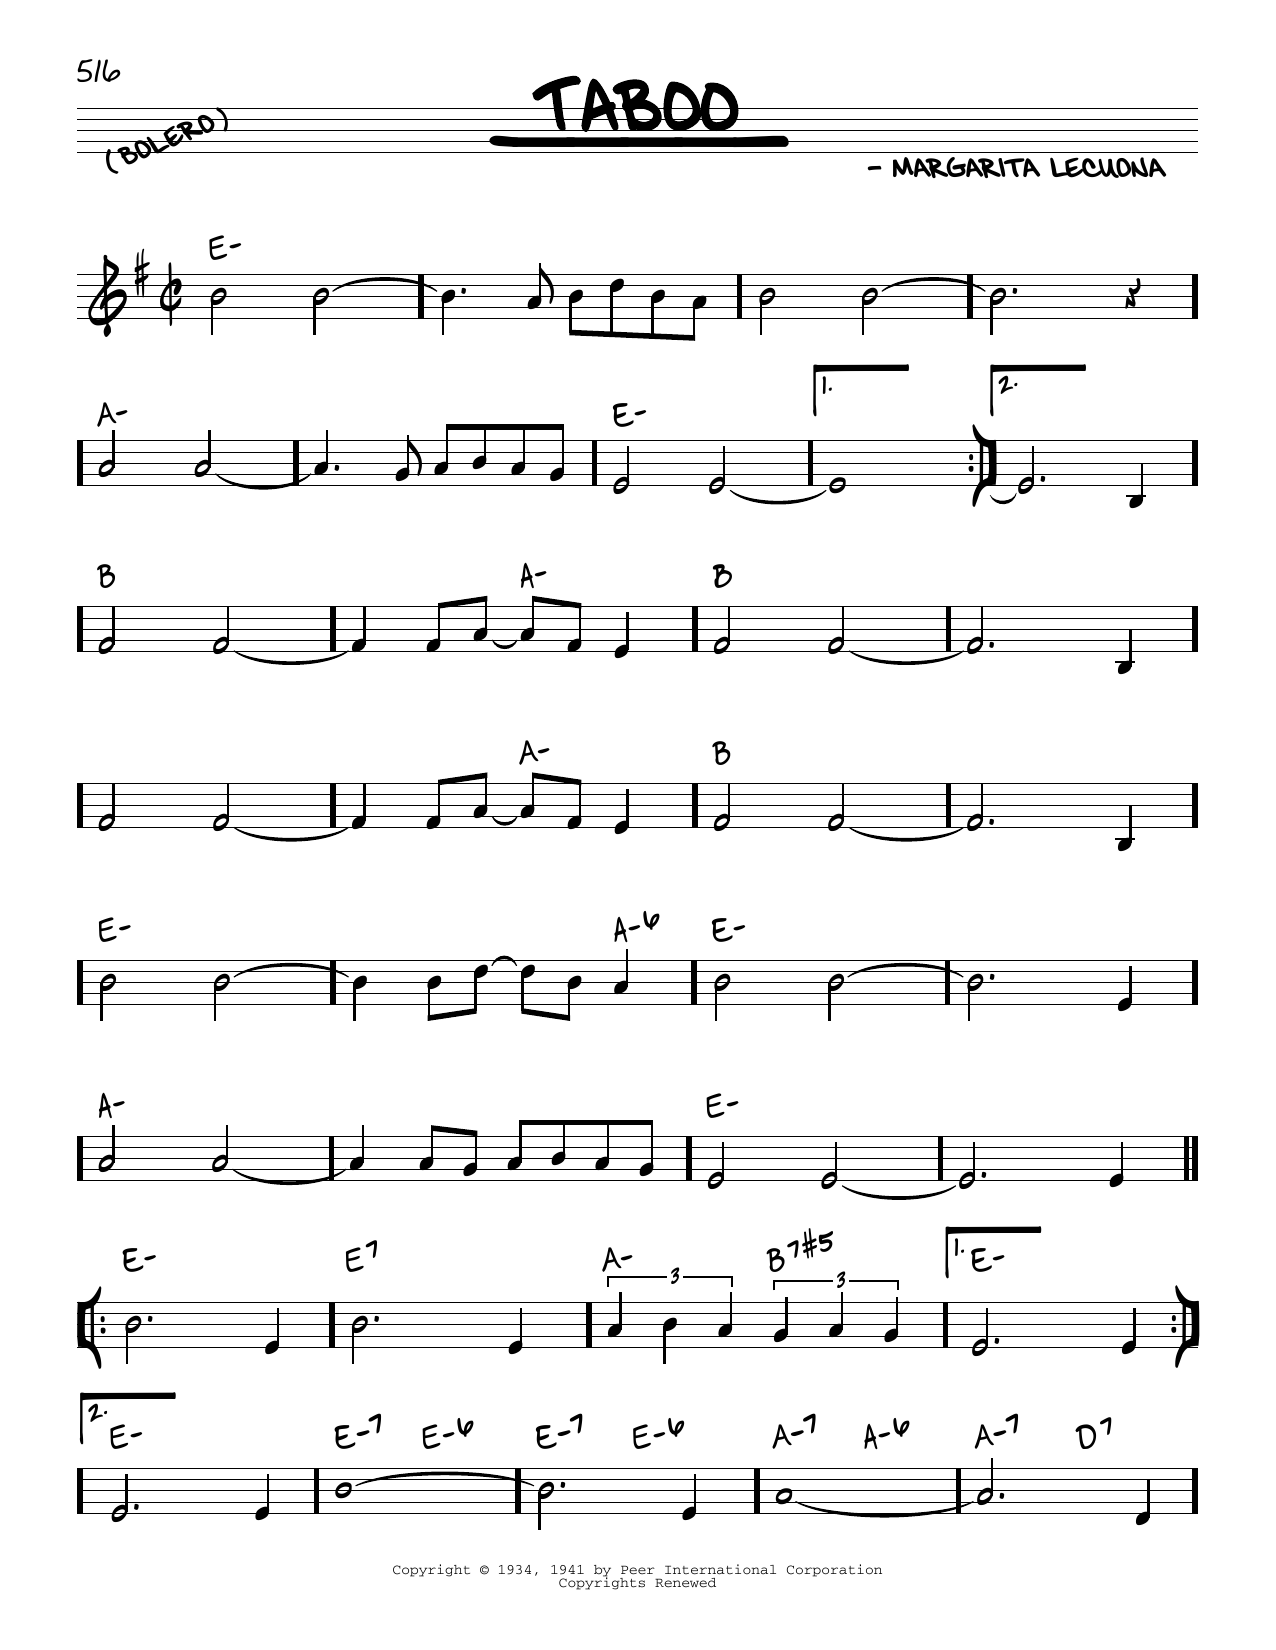 Margarita Lecuona Taboo sheet music notes and chords. Download Printable PDF.